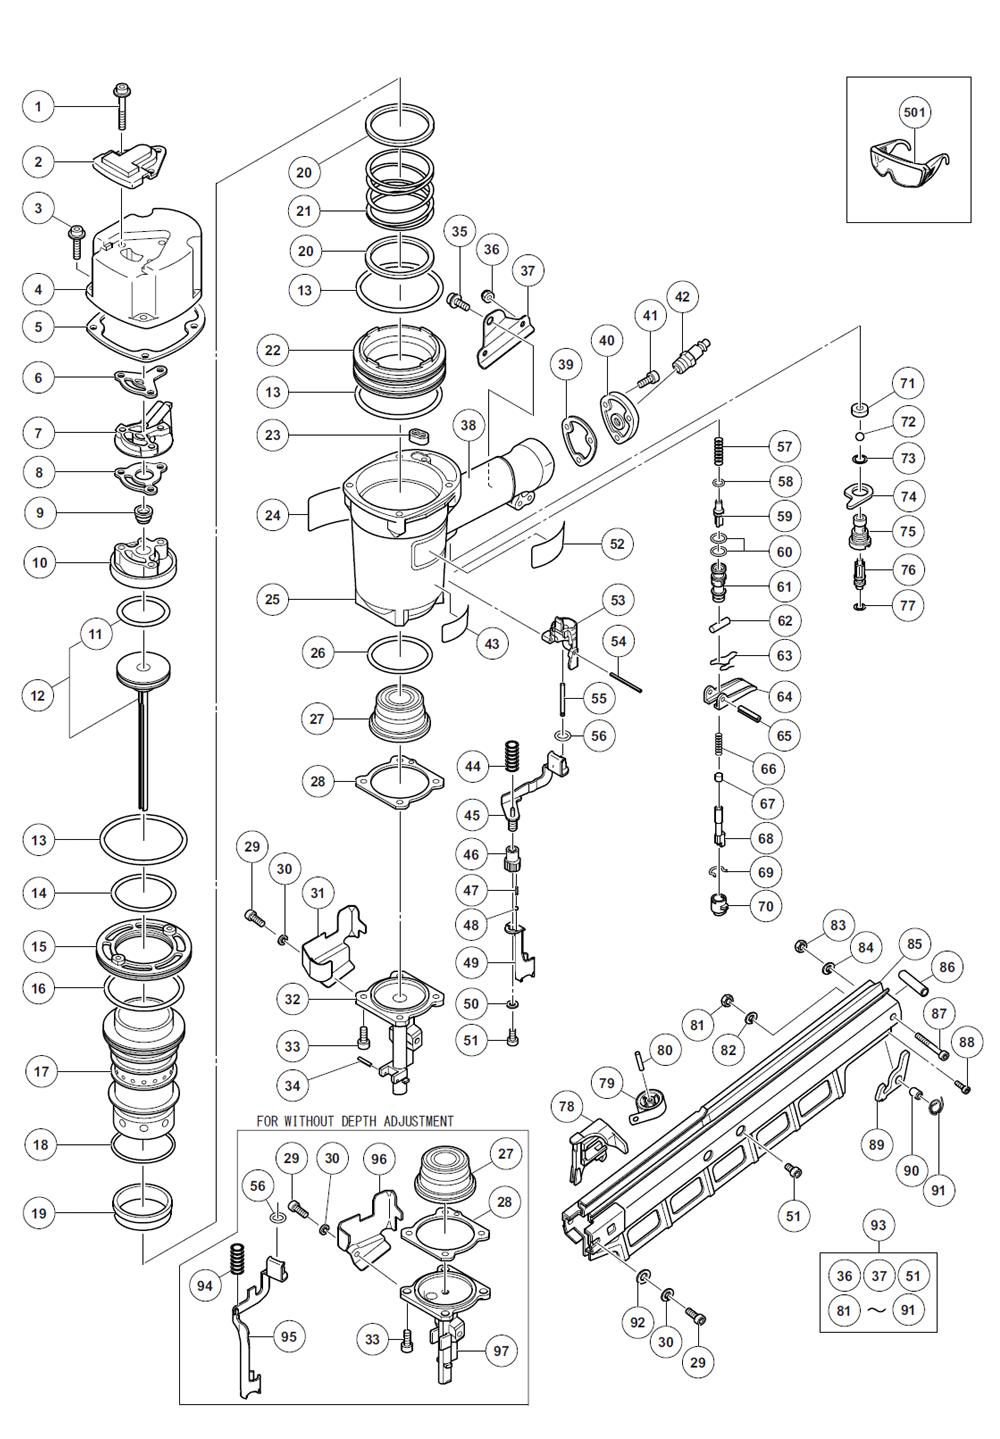 hitachi nr83a3s parts schematic